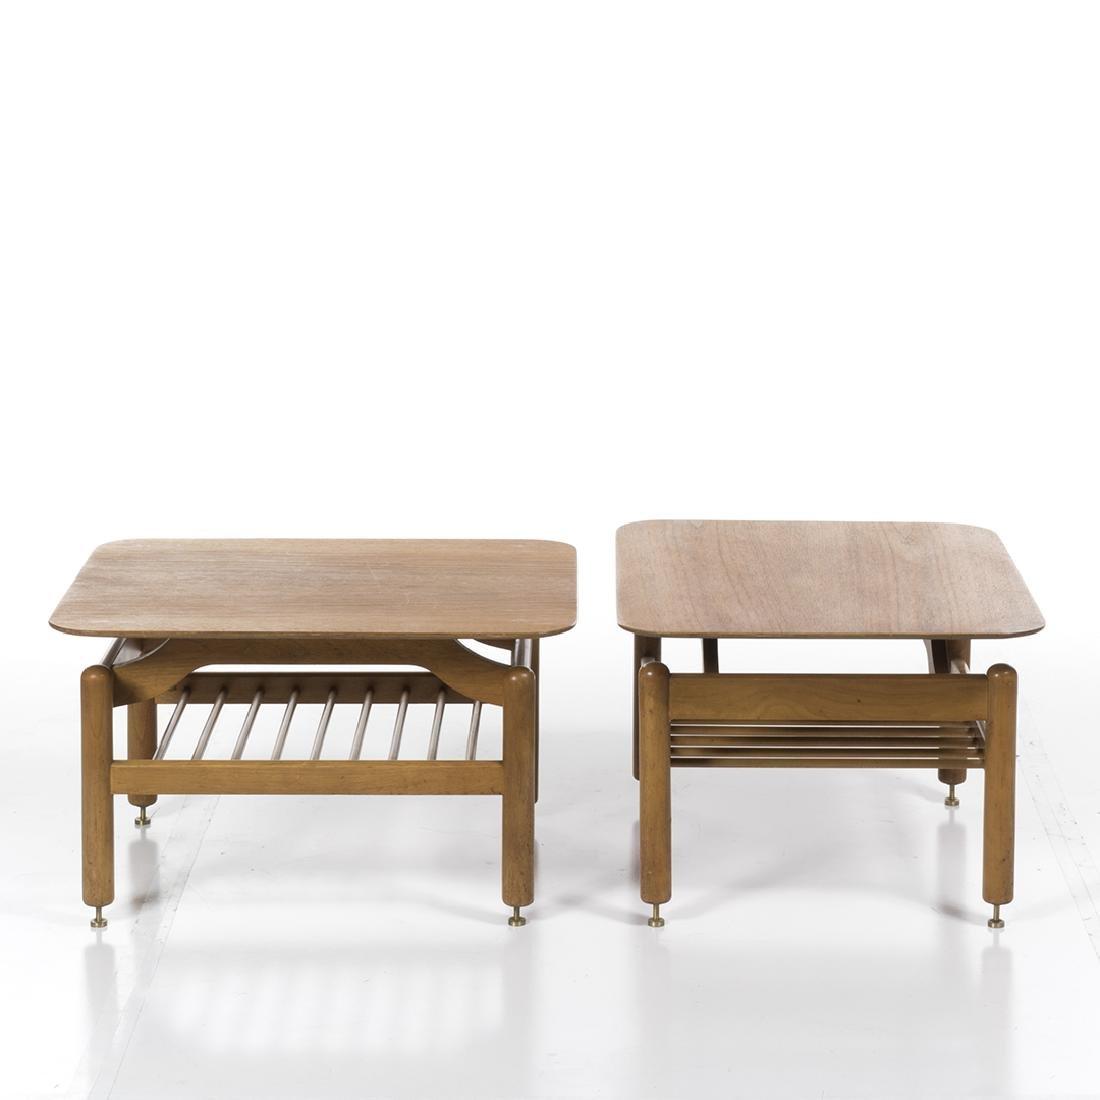 Greta Grossman Tables (2) - 2